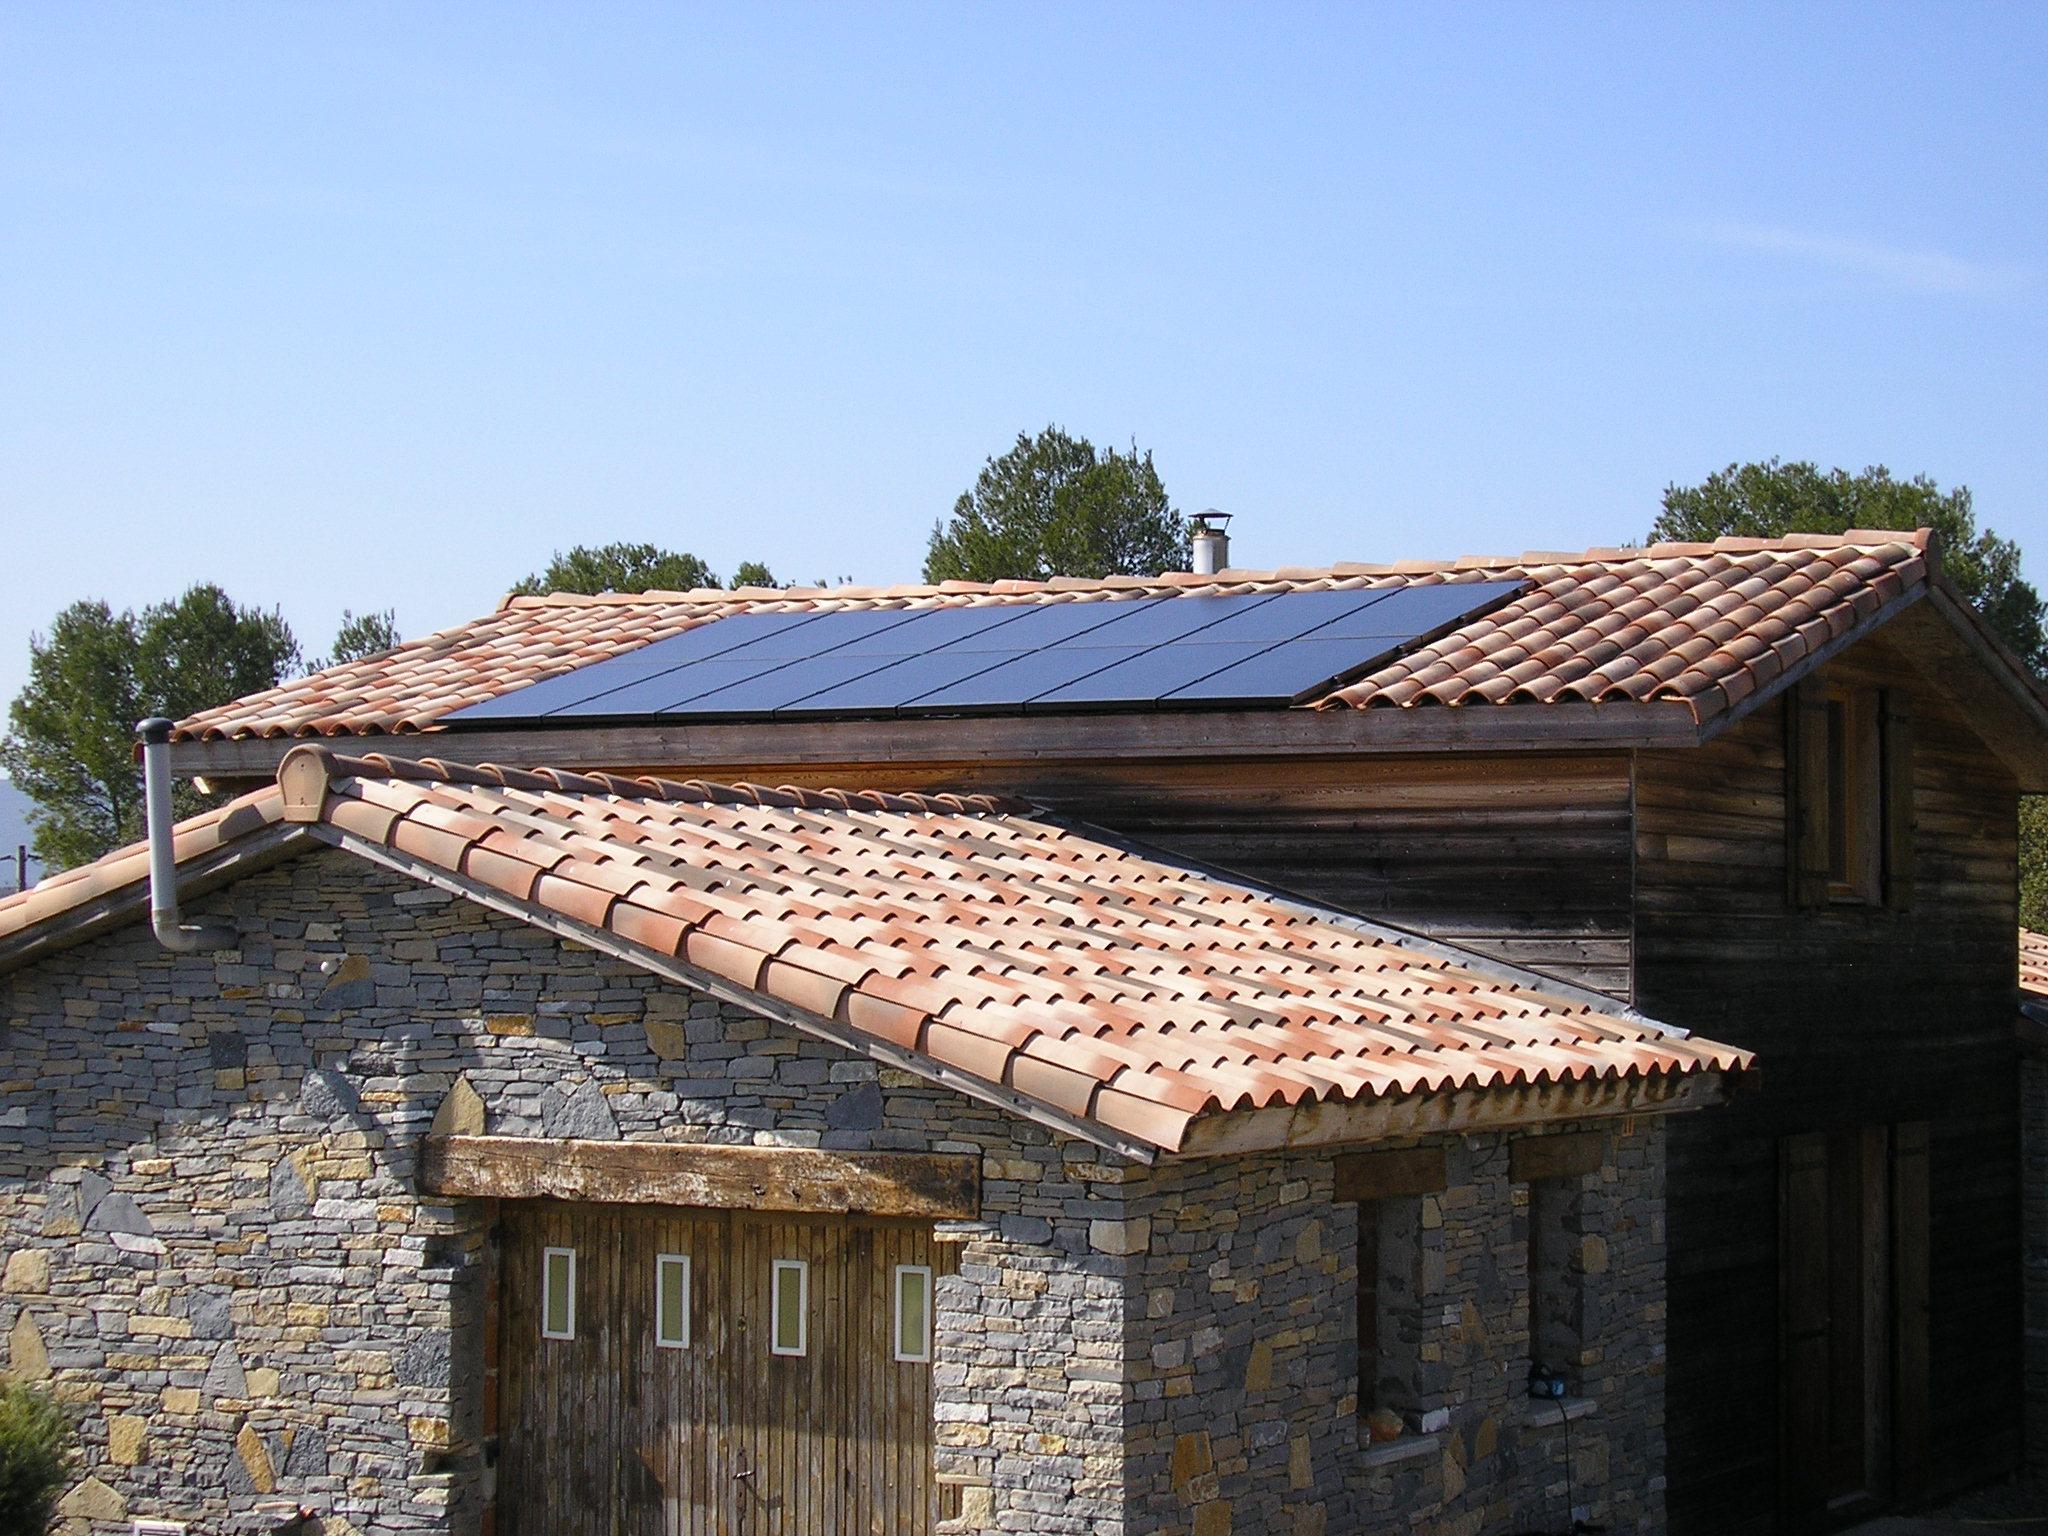 https://static.onlc.eu/natura-energiesNDD//123791321079.jpg